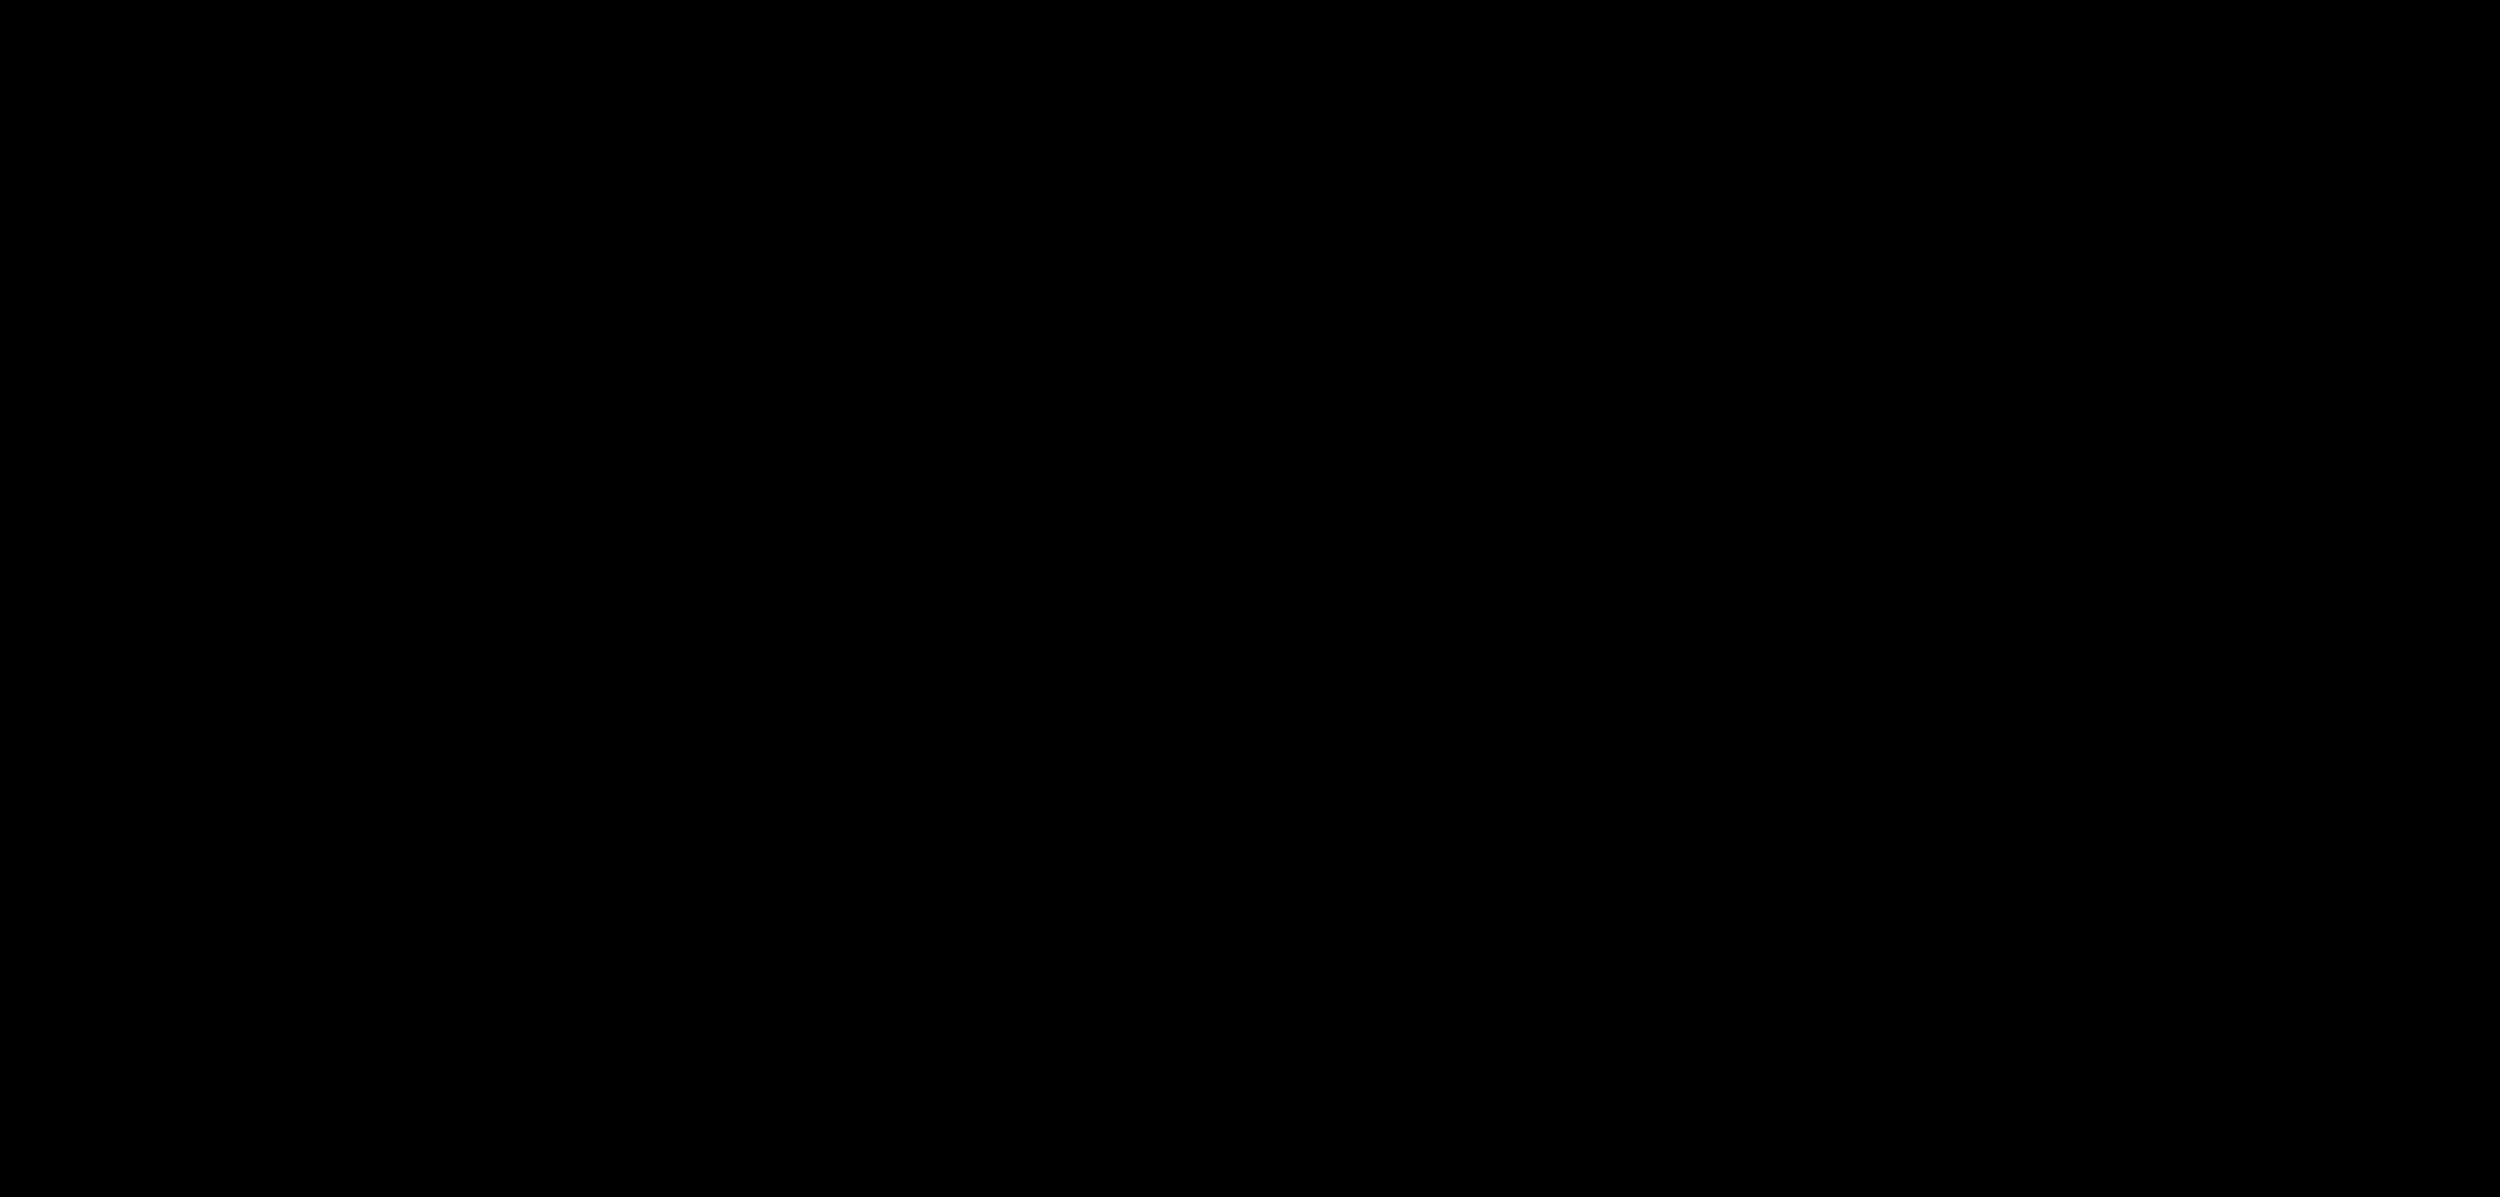 IX.png